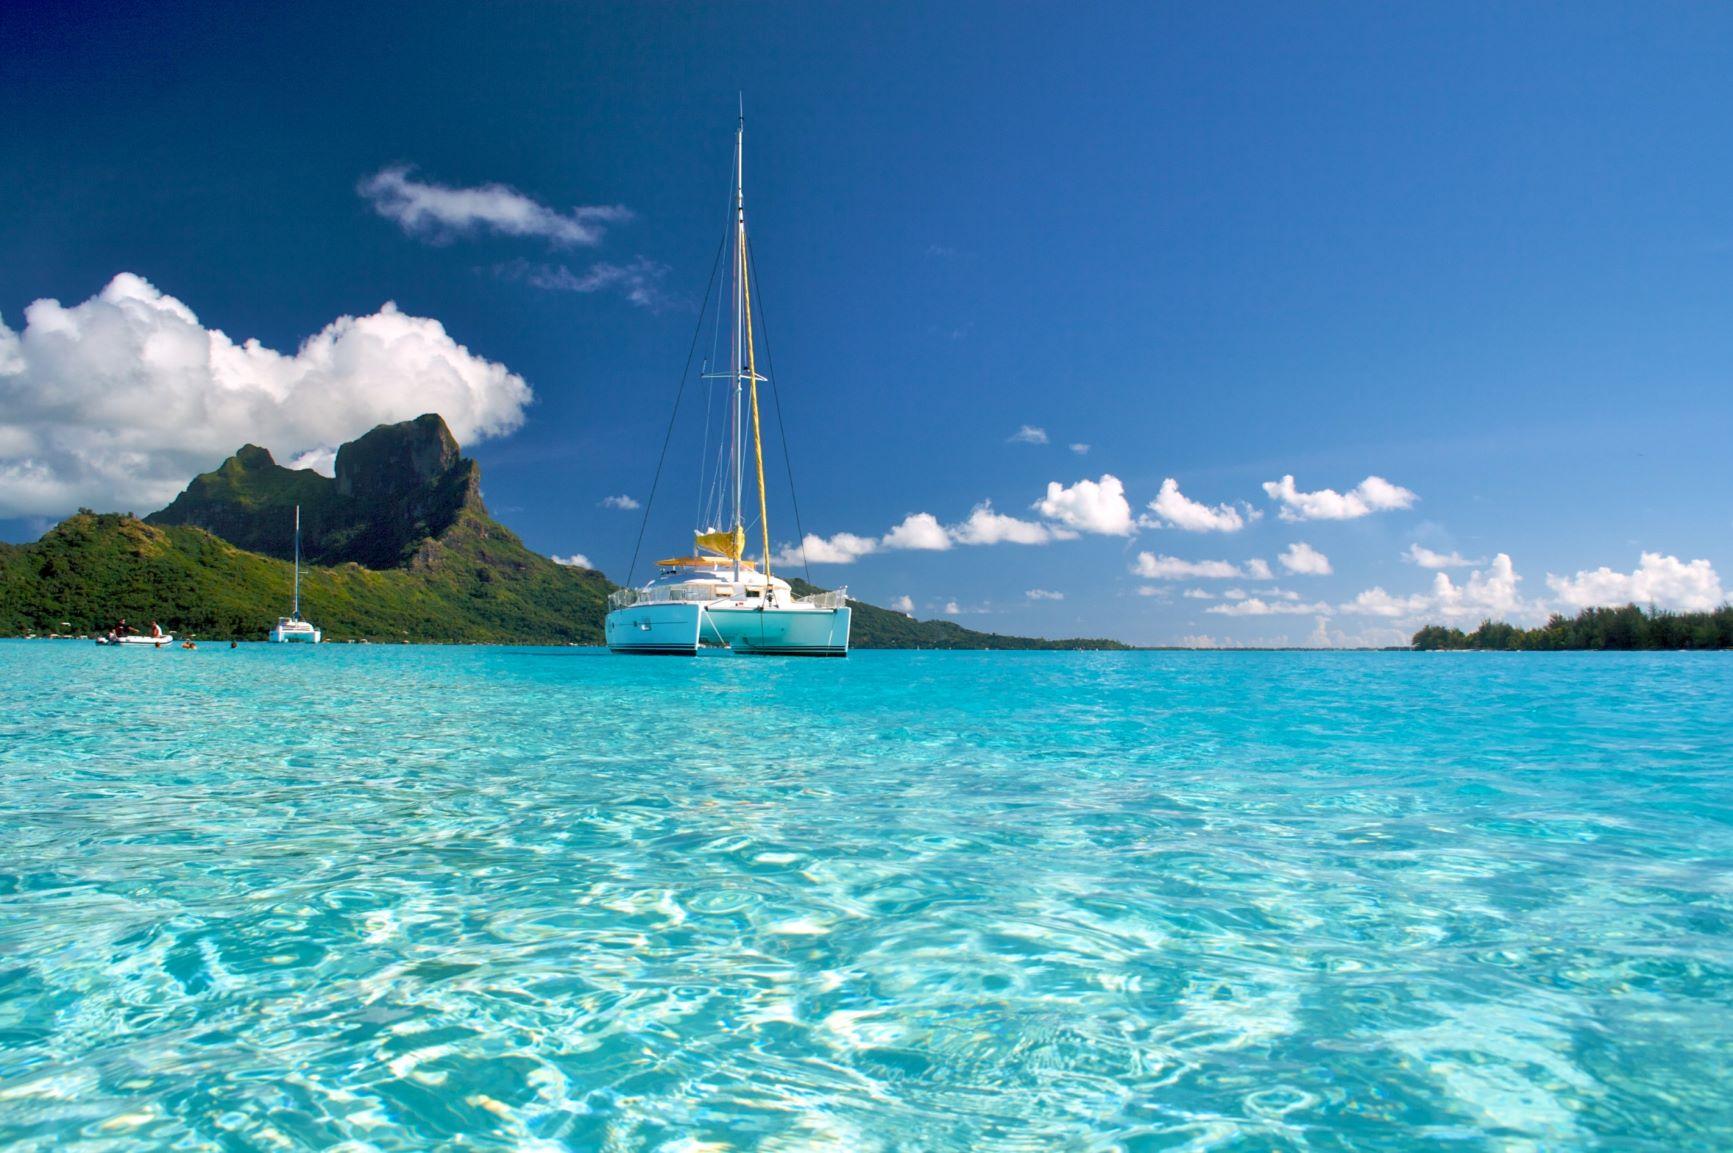 https://tahititourisme.fr/wp-content/uploads/2020/10/Catamaran-7-Bora-Bora-@TYC-B.Picard.jpg